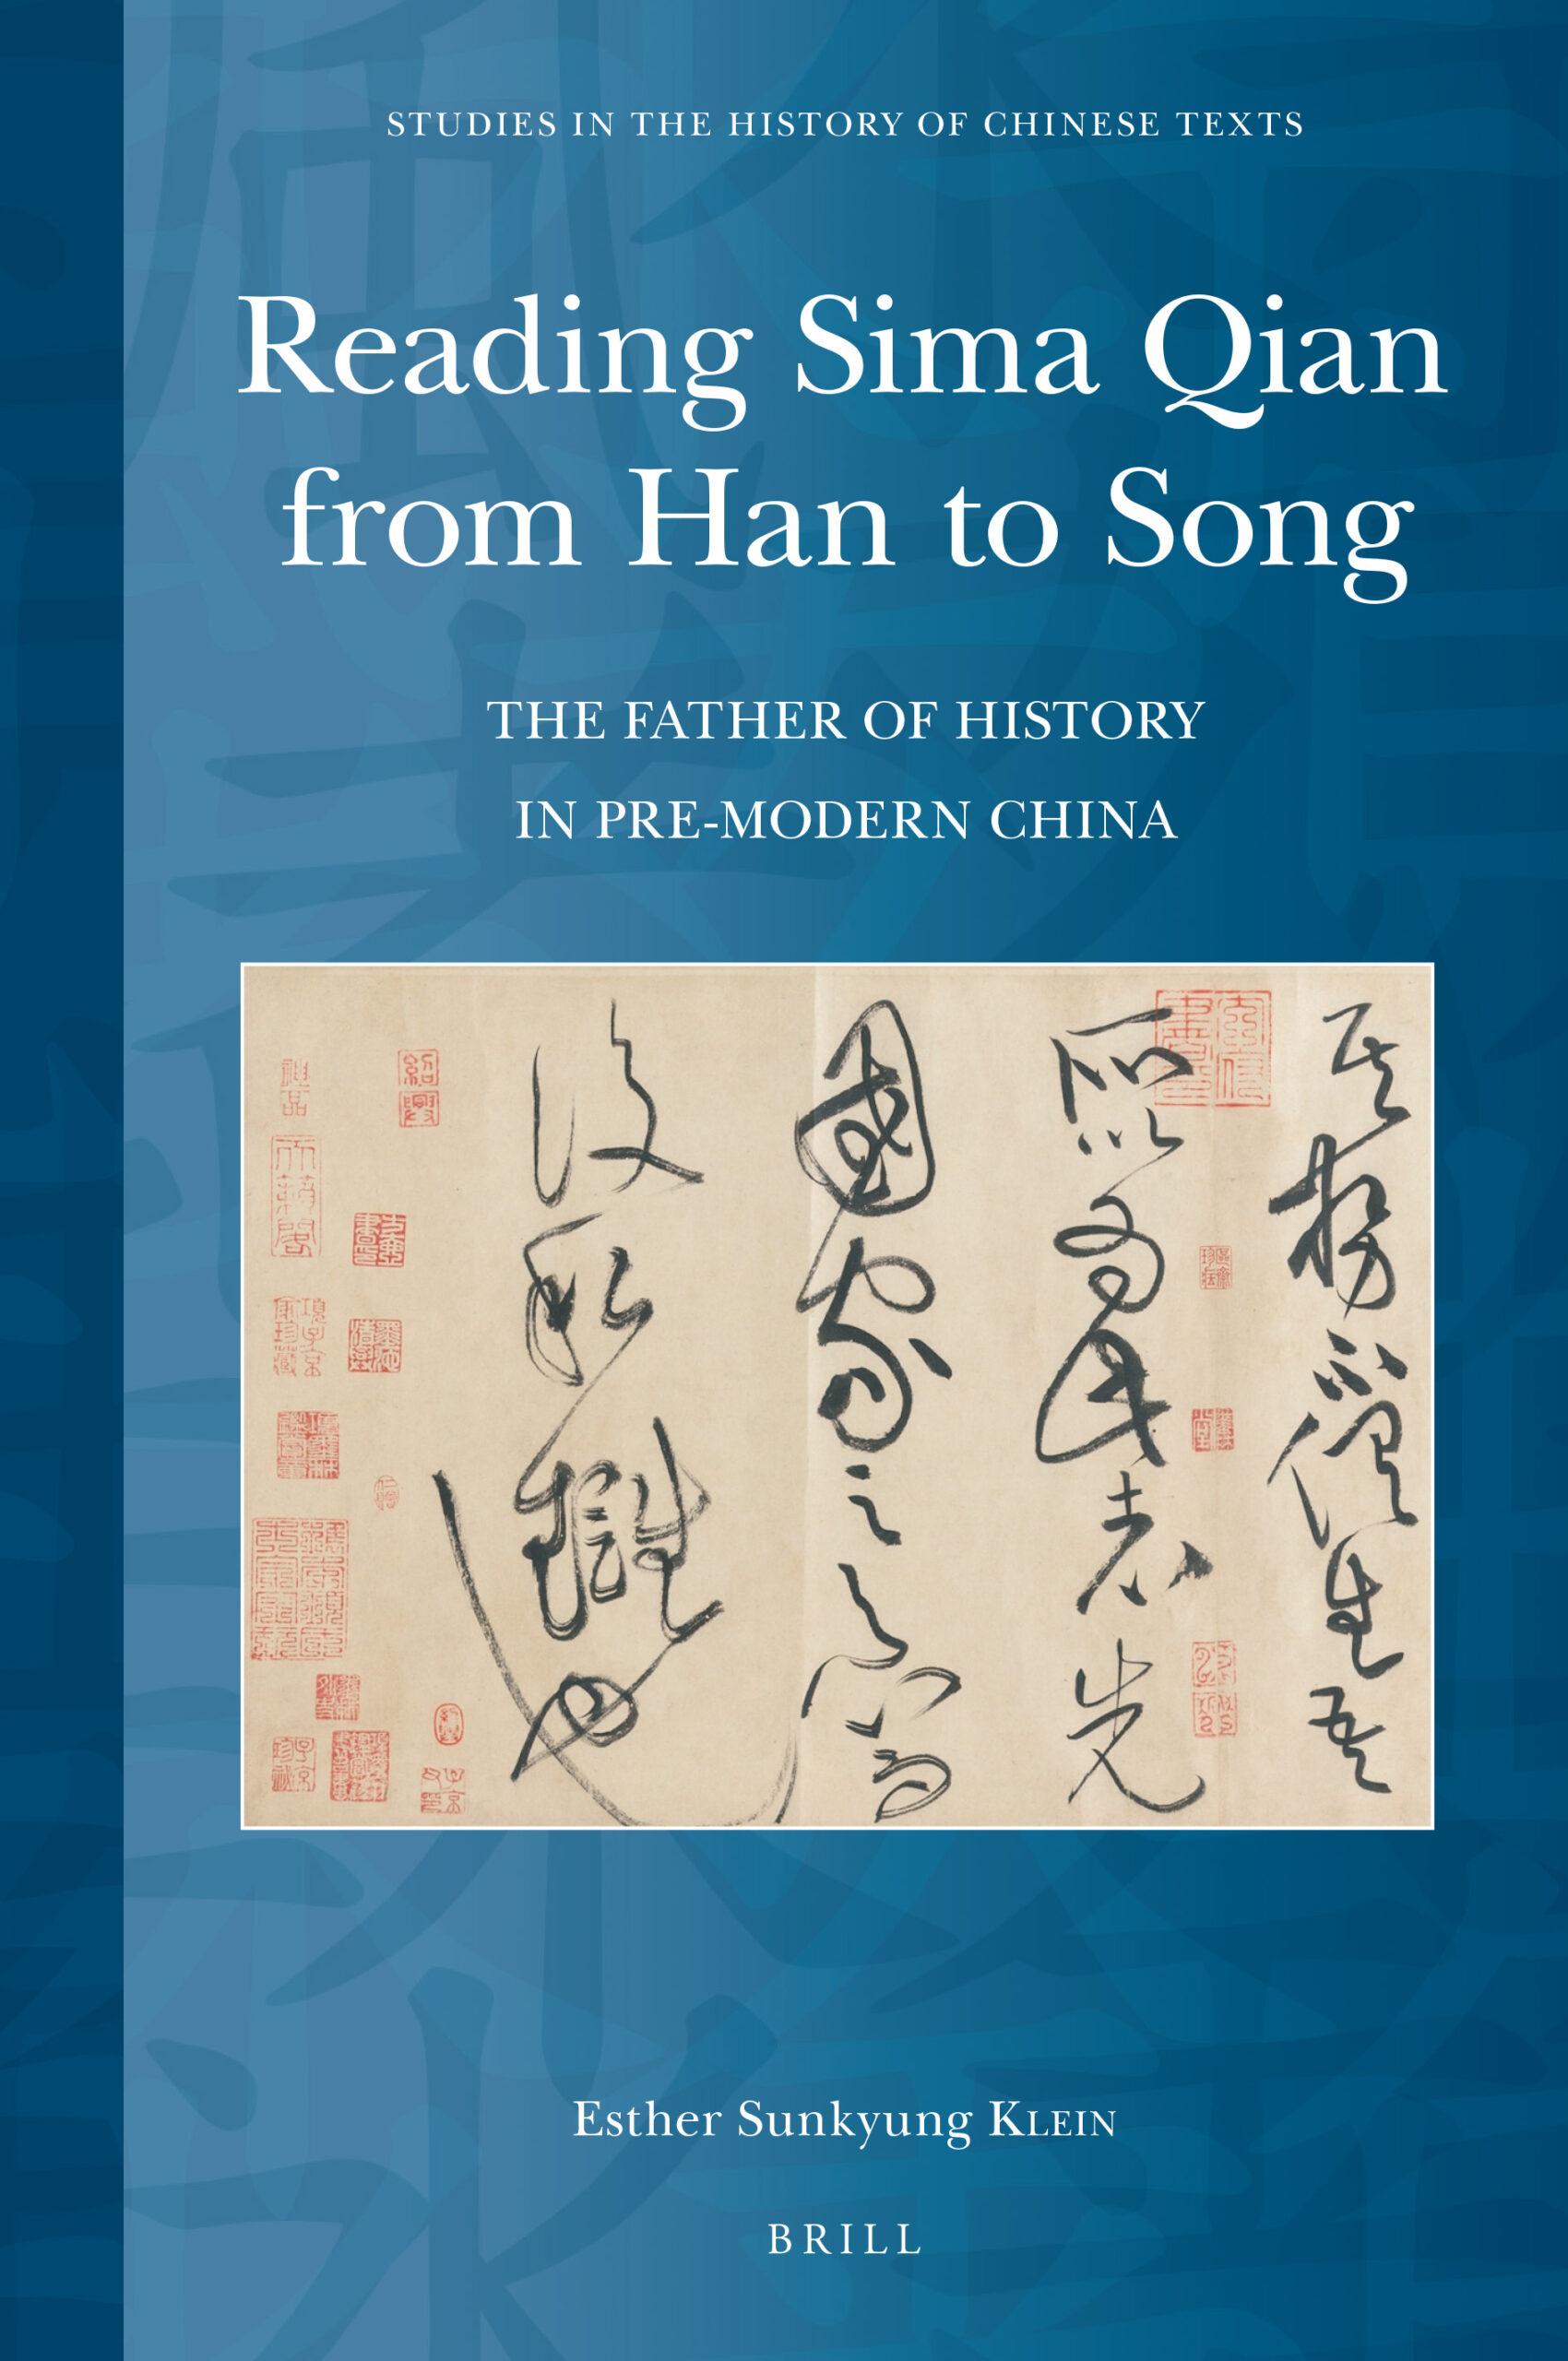 Reading-Sima-Qian Cover